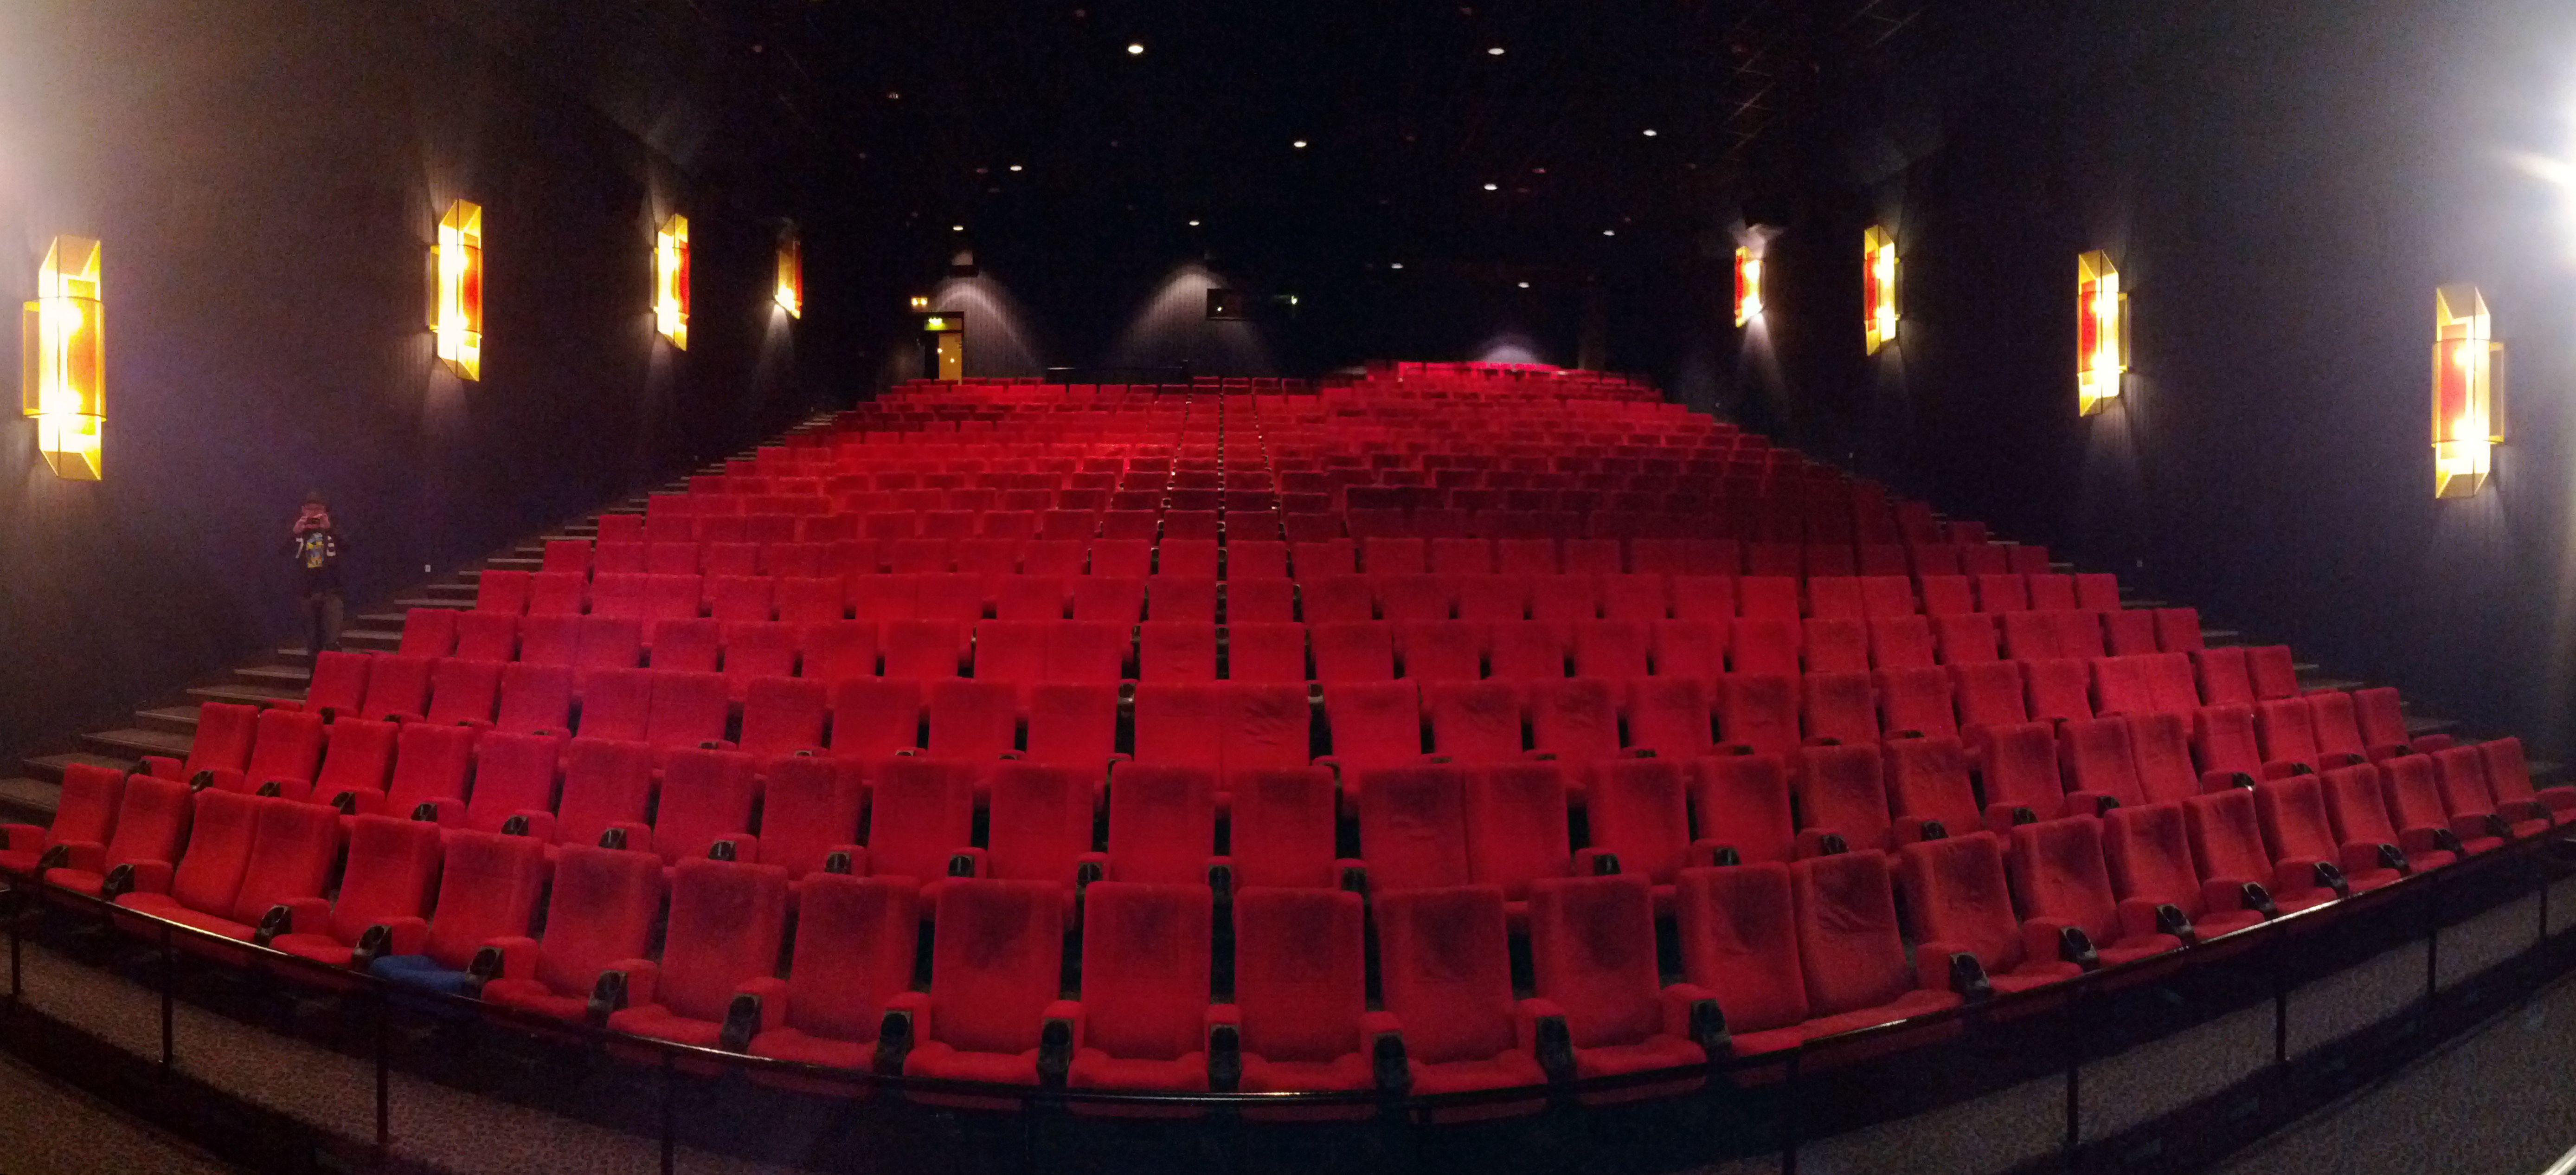 Borsighallen Kino